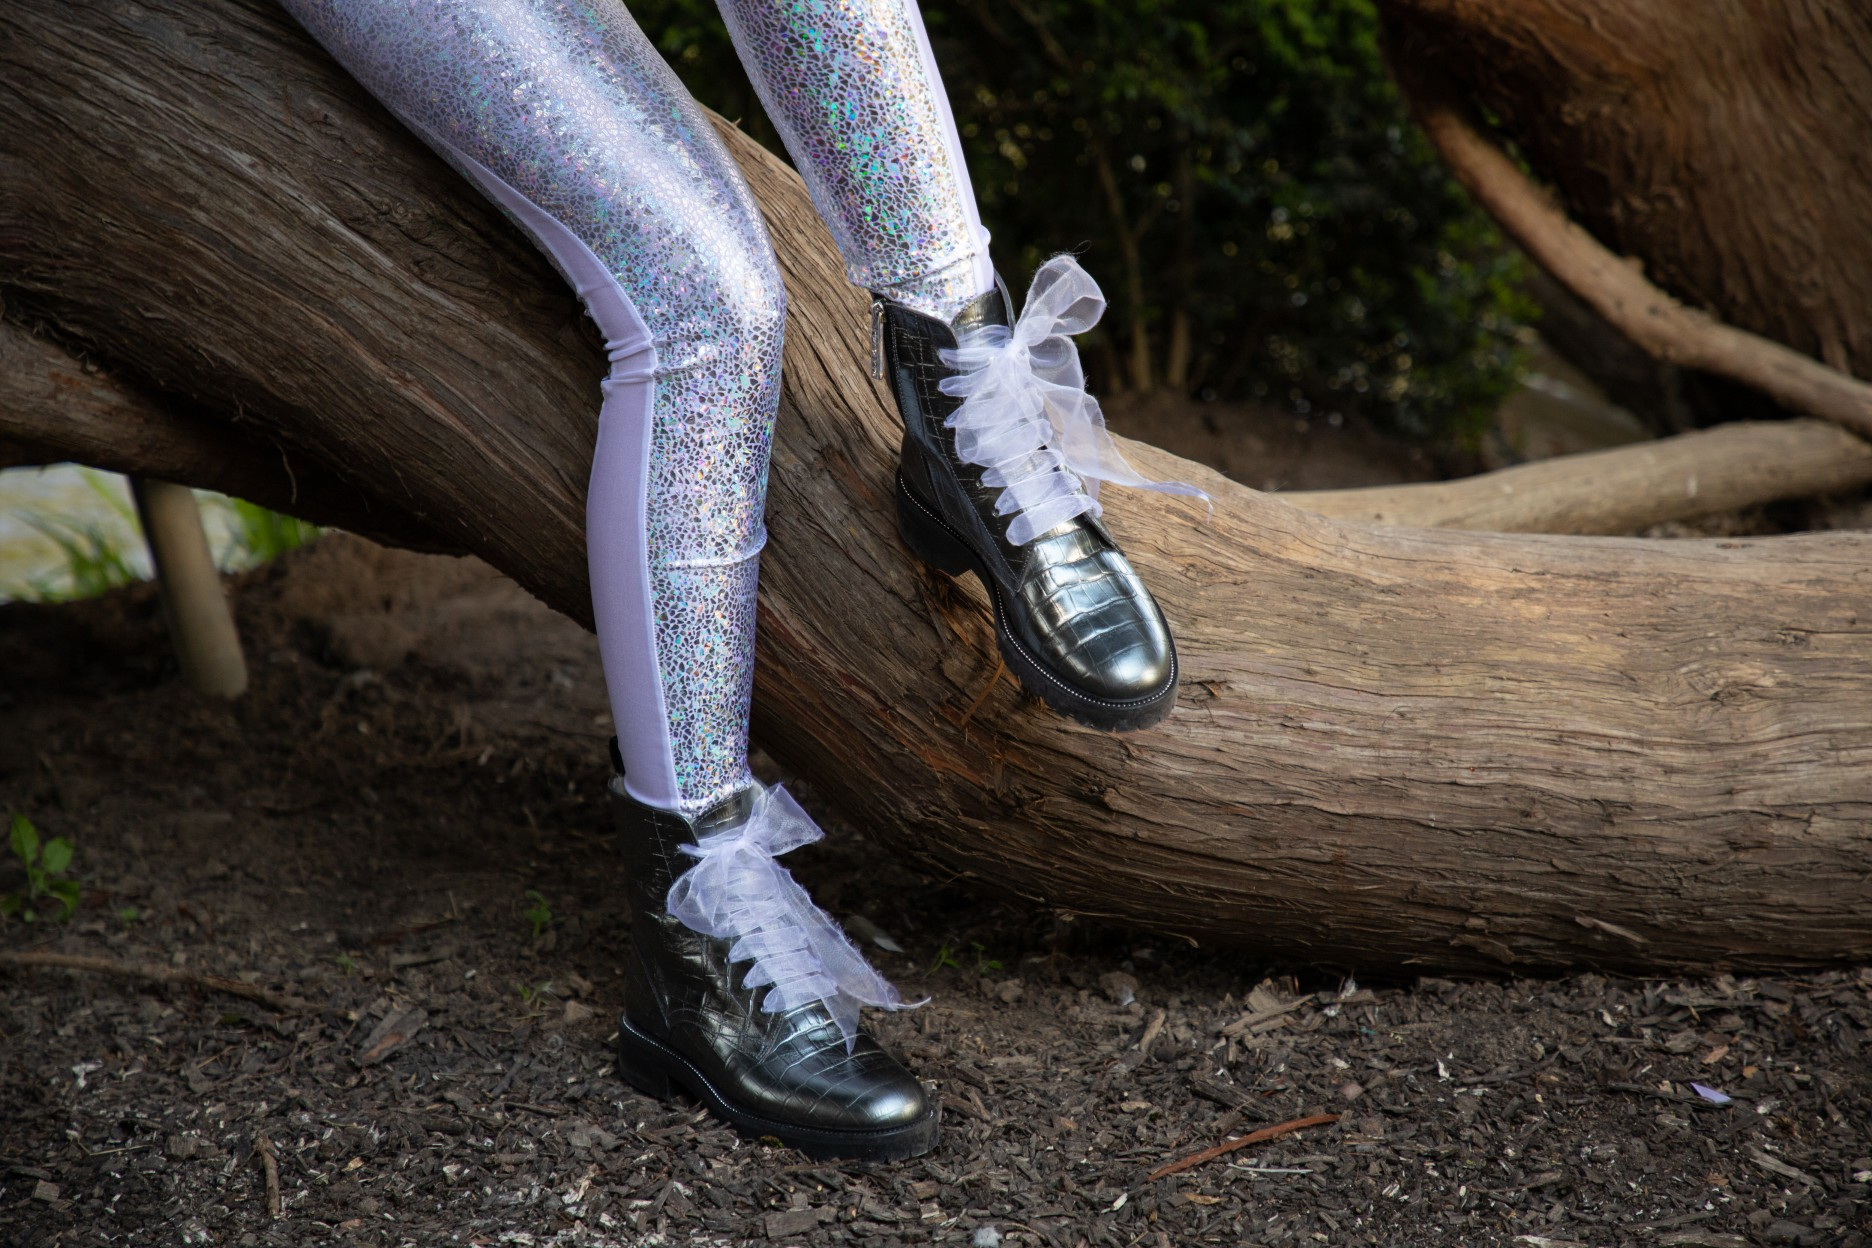 wedding dr martens - bridal boots - wedding footwear - unique wedding shoes